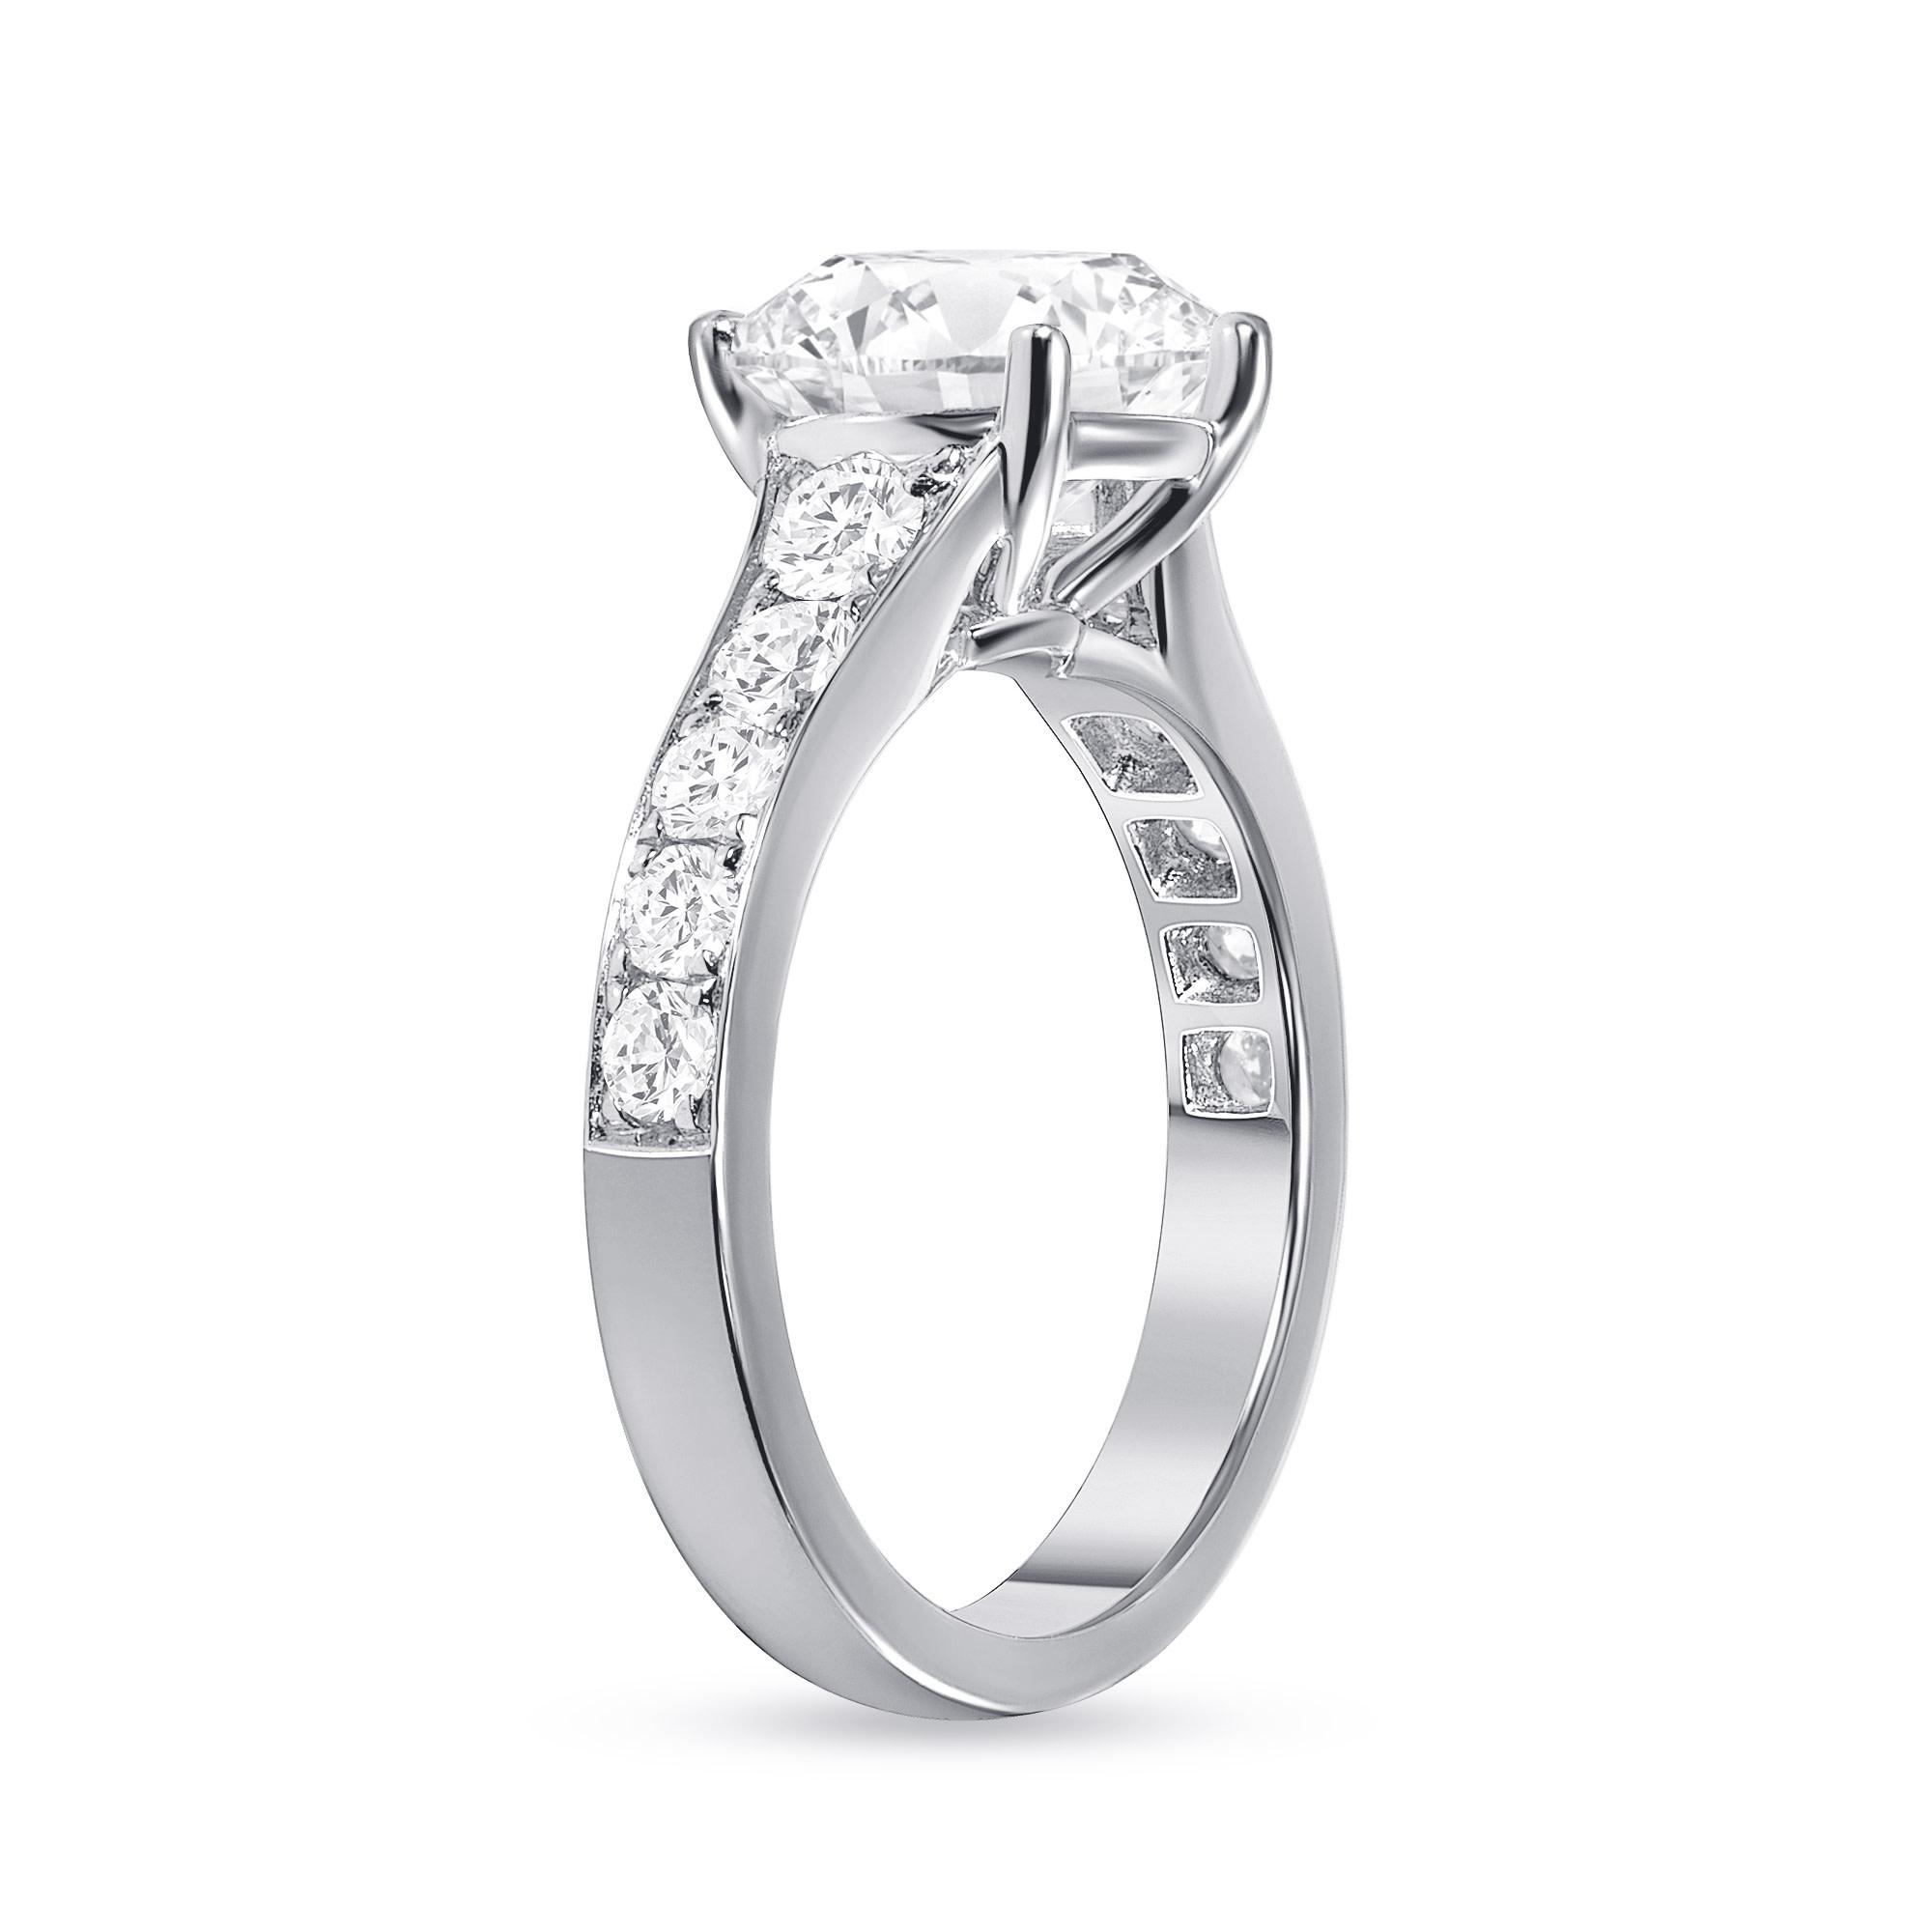 2.5 Carats Pave Diamond Engagement Ring